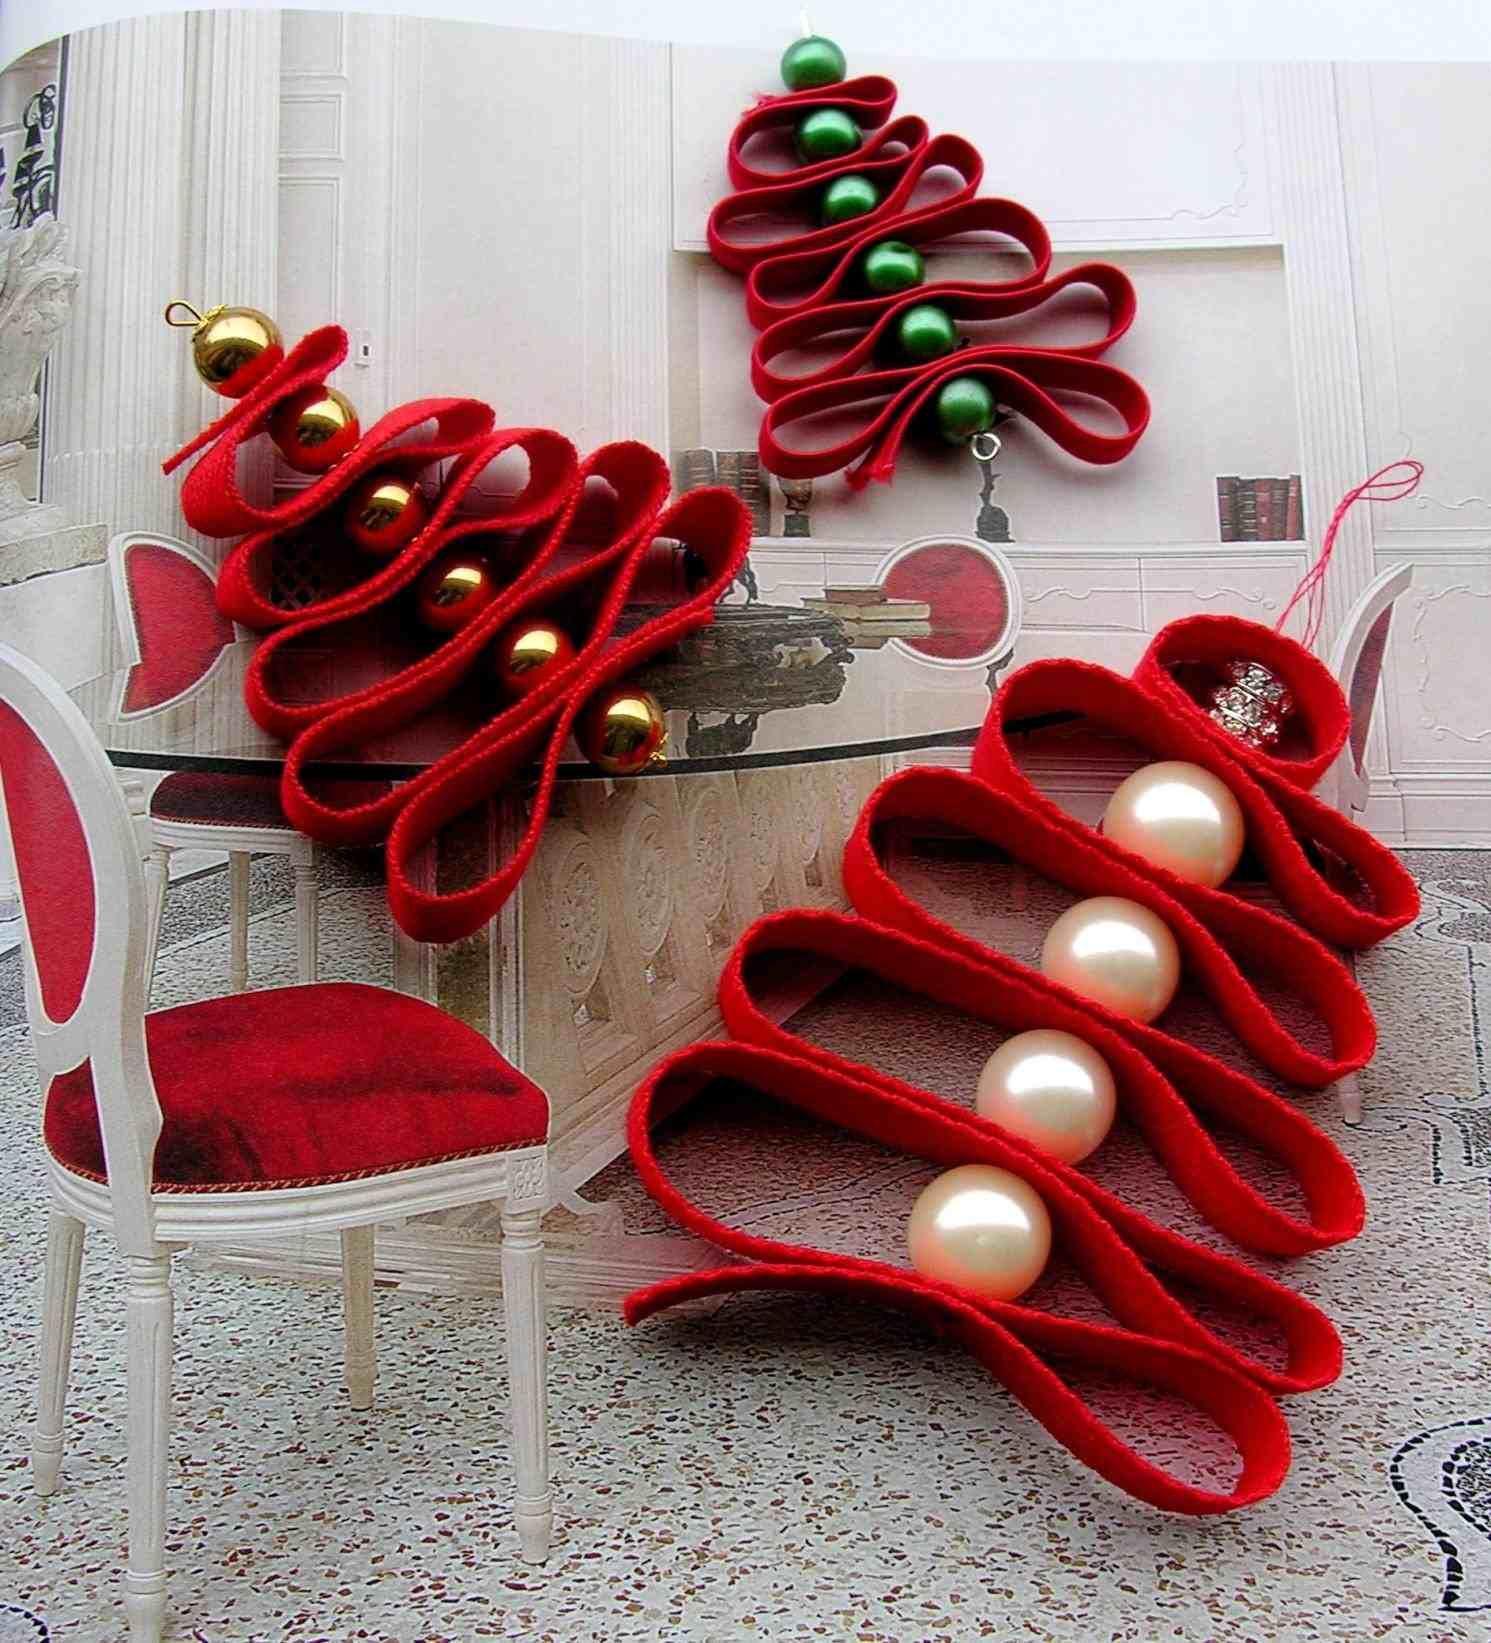 New Post Homemade Christmas Decorations Pinterest Interesting Visit Xmastsite